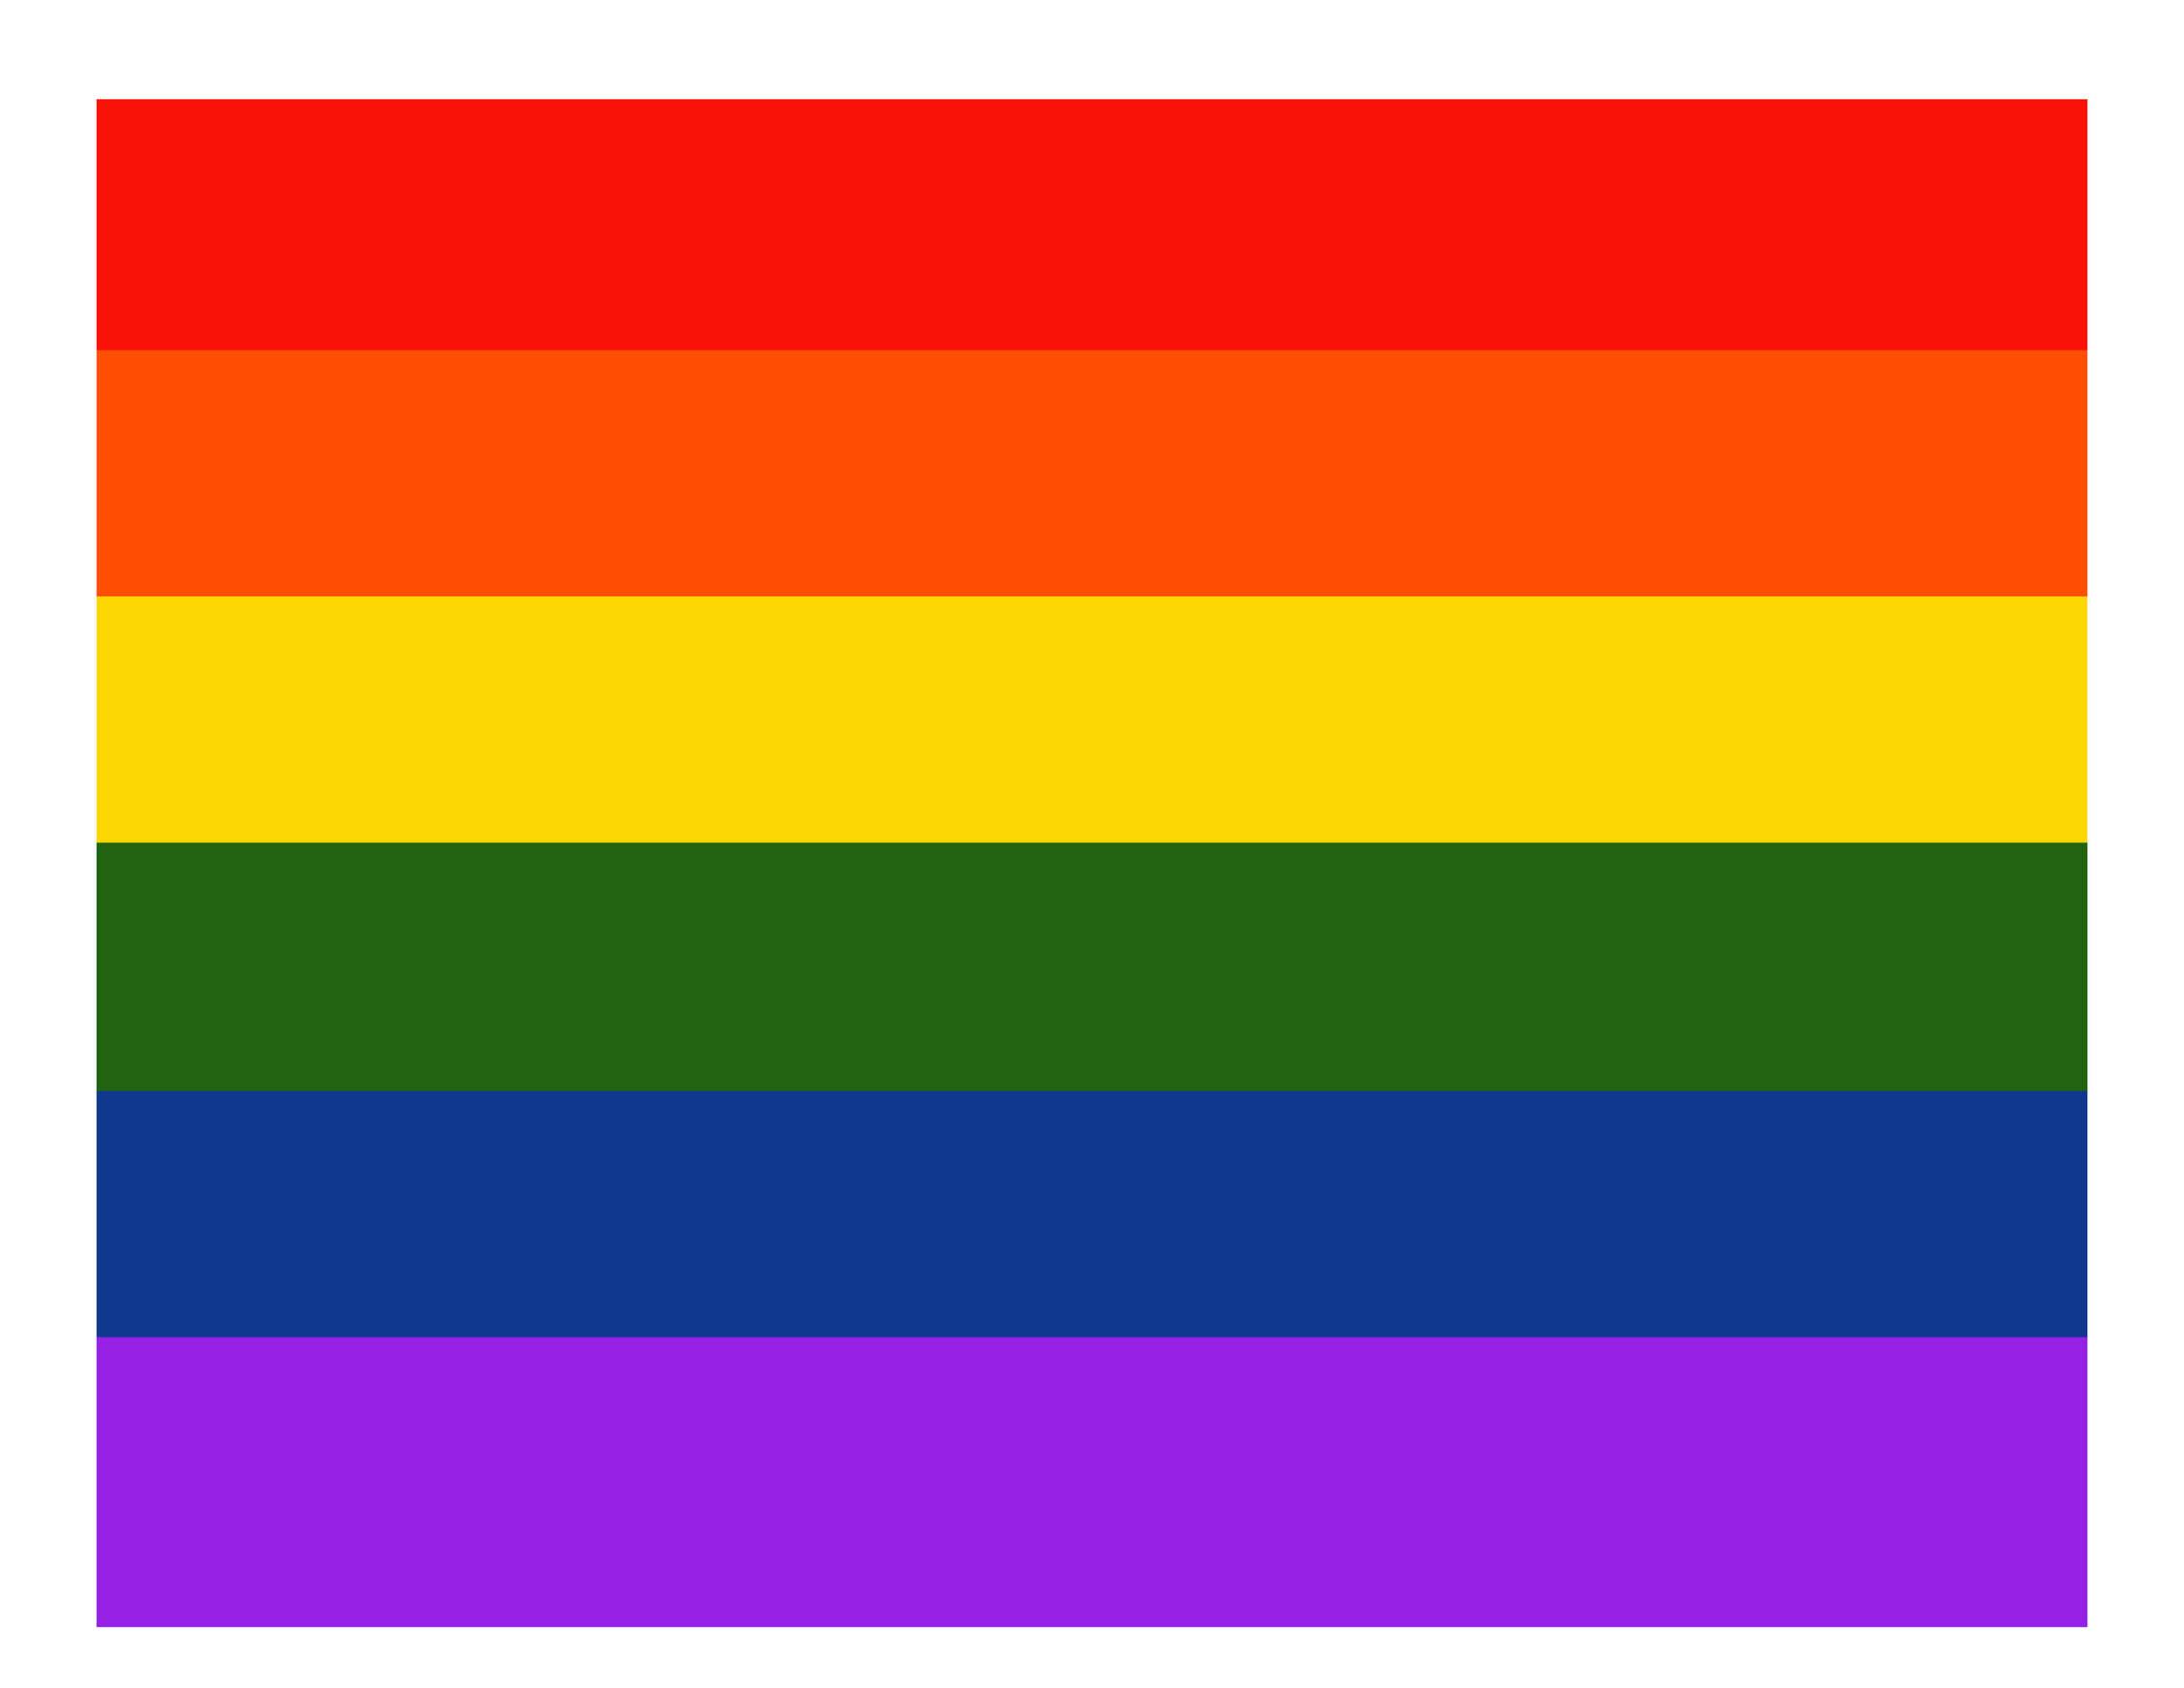 recherche rencontre gay flags a Houilles